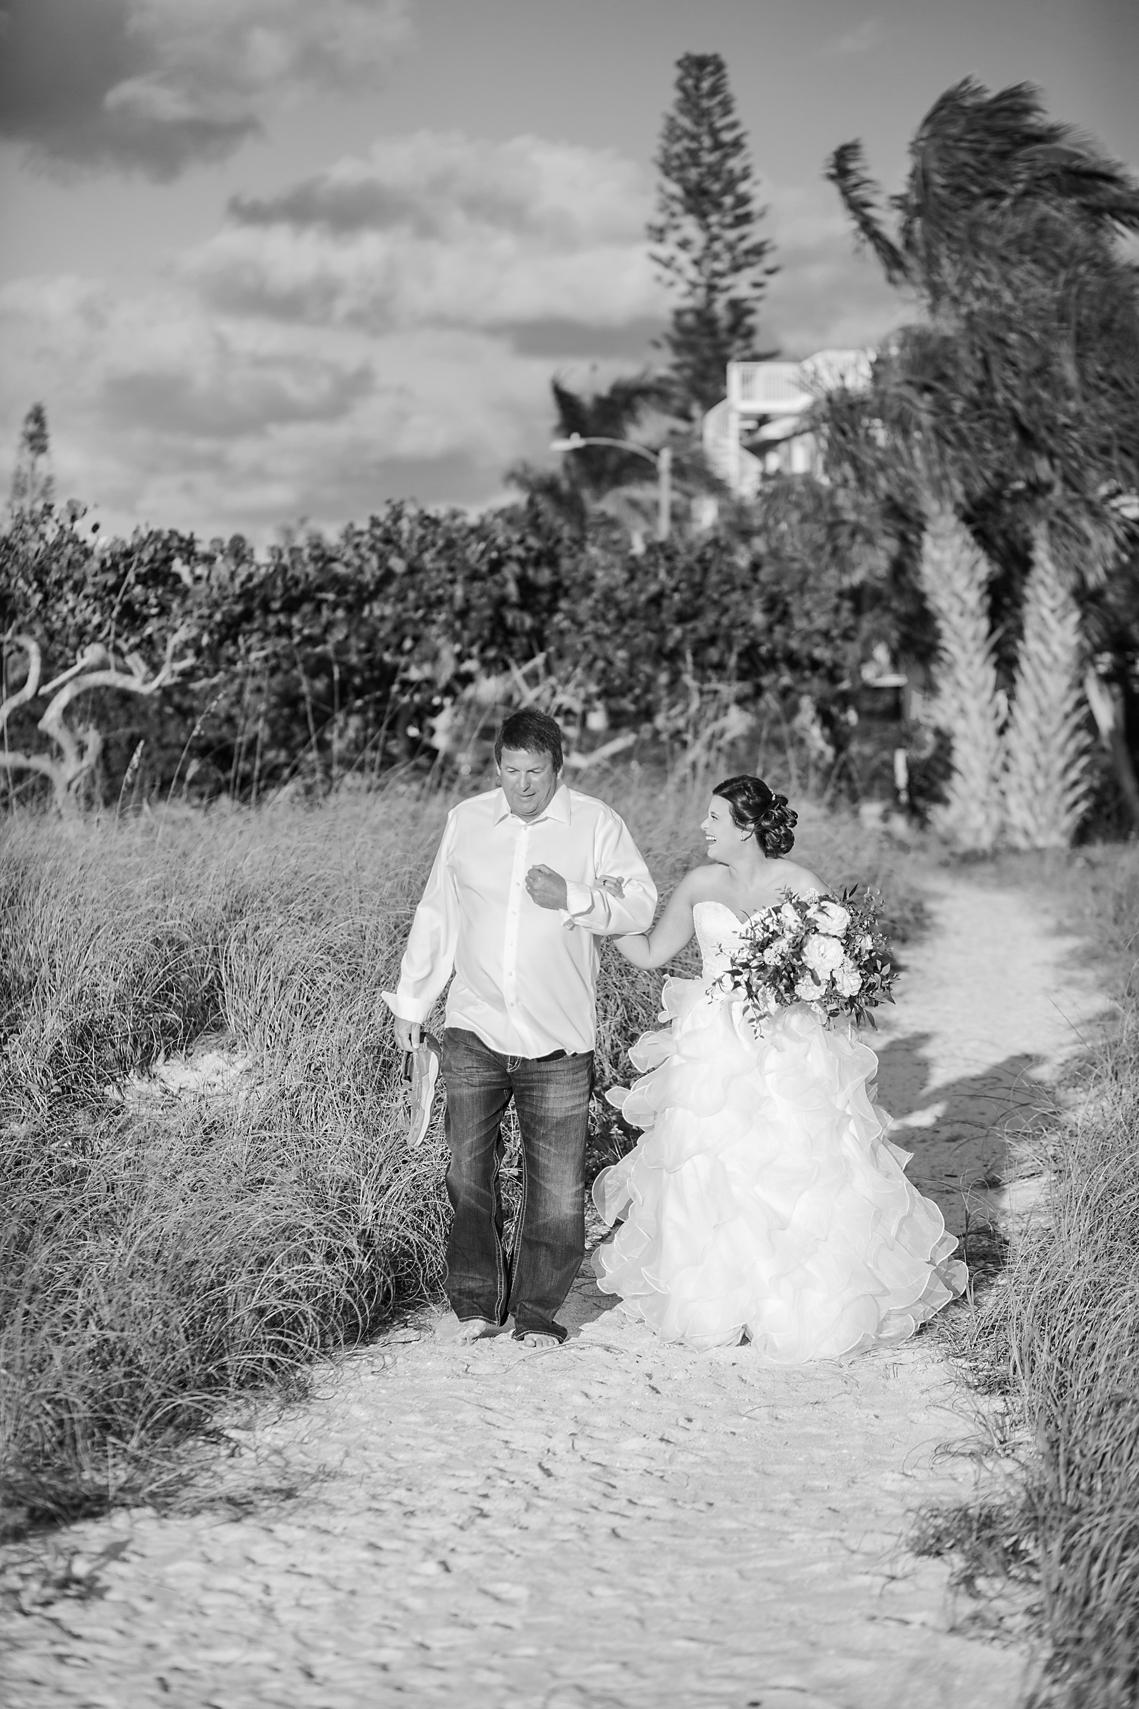 Bailey + Chalin - Anna Maria Island Wedding Photographer - Destination Wedding Photography - Emily & Co. Photography - Beach Wedding Photography (23).jpg